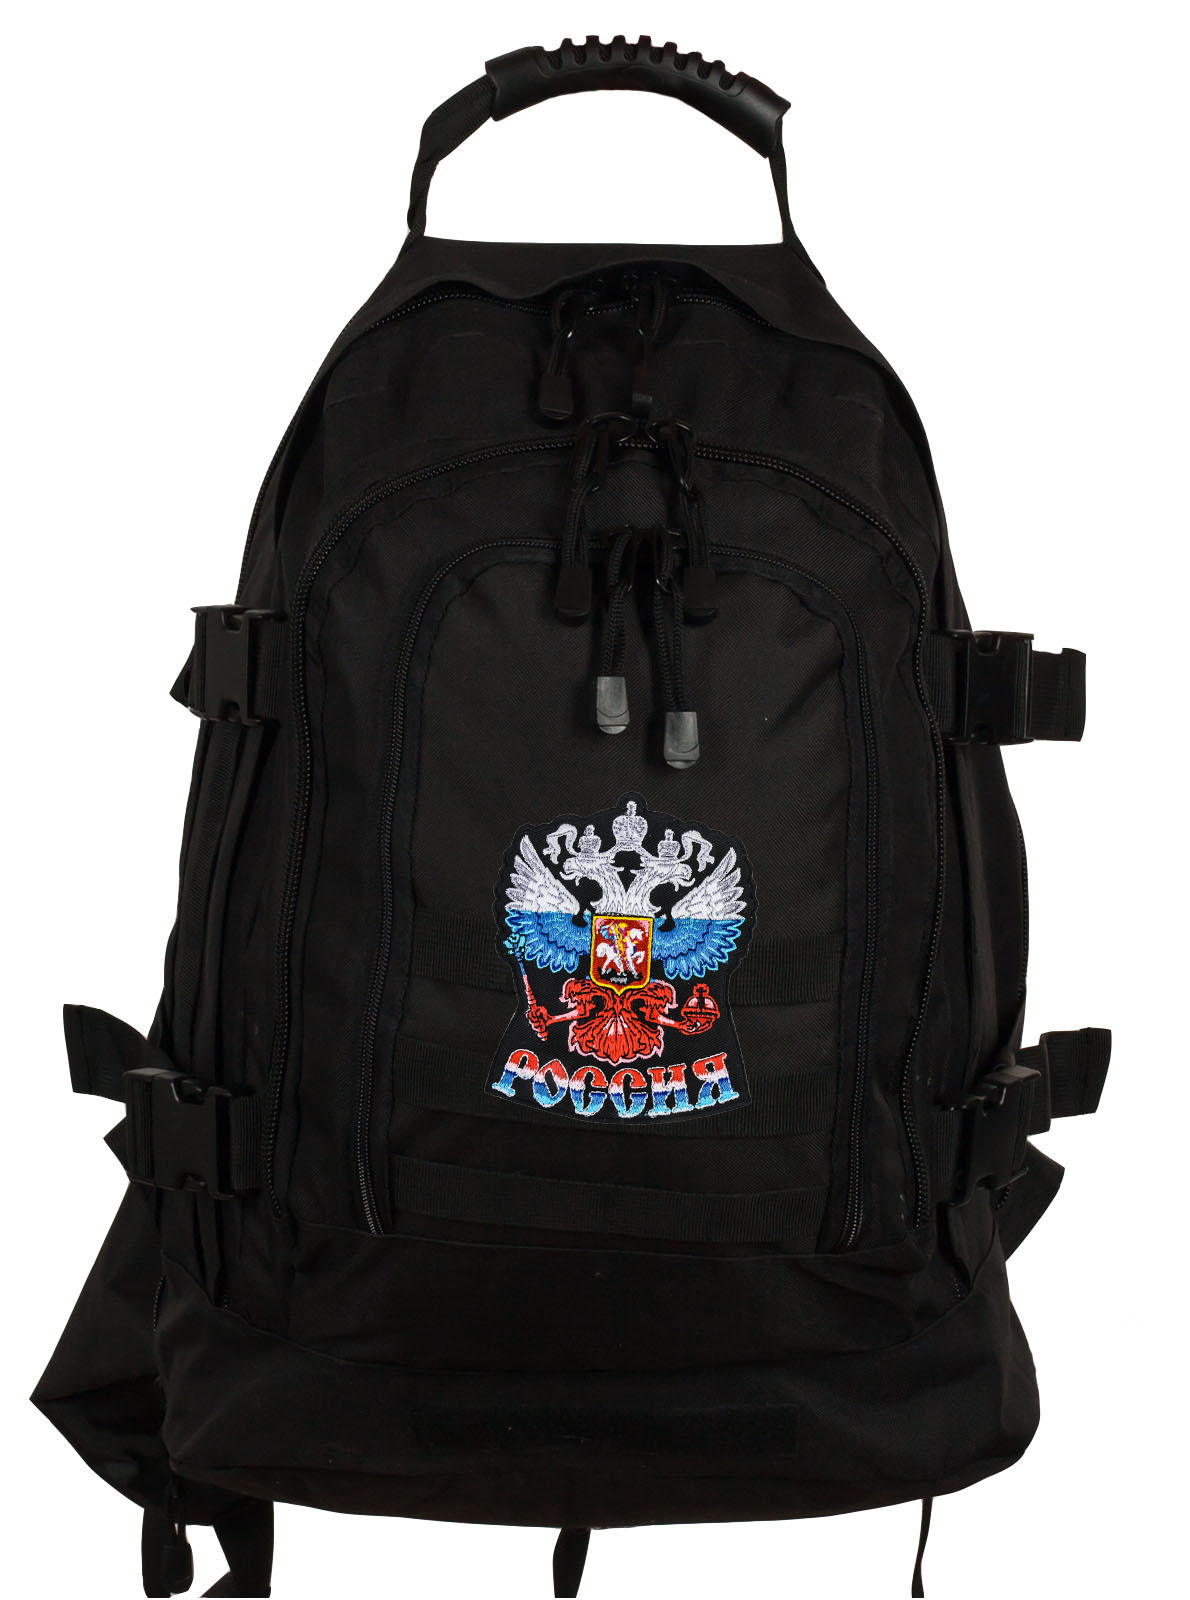 "Черный армейский рюкзак 3-Day Expandable Backpack 08002A Black с эмблемой ""Россия"""